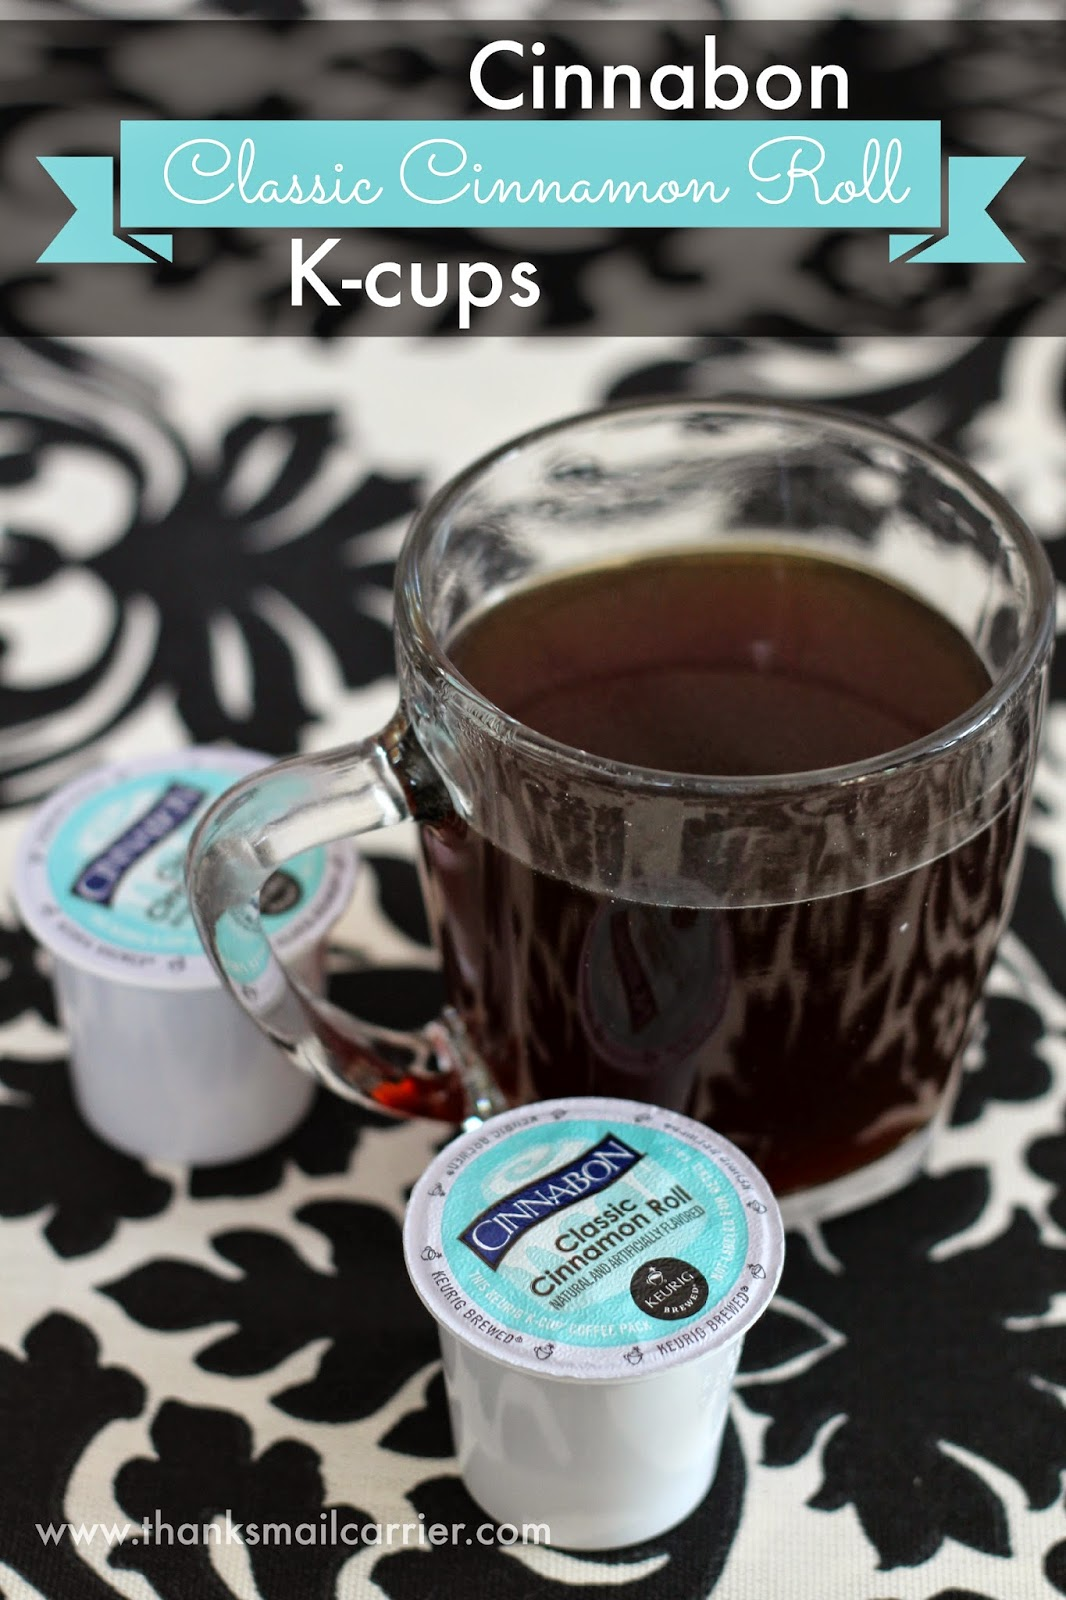 Cinnabon Cinnamon Roll k-cup coffee